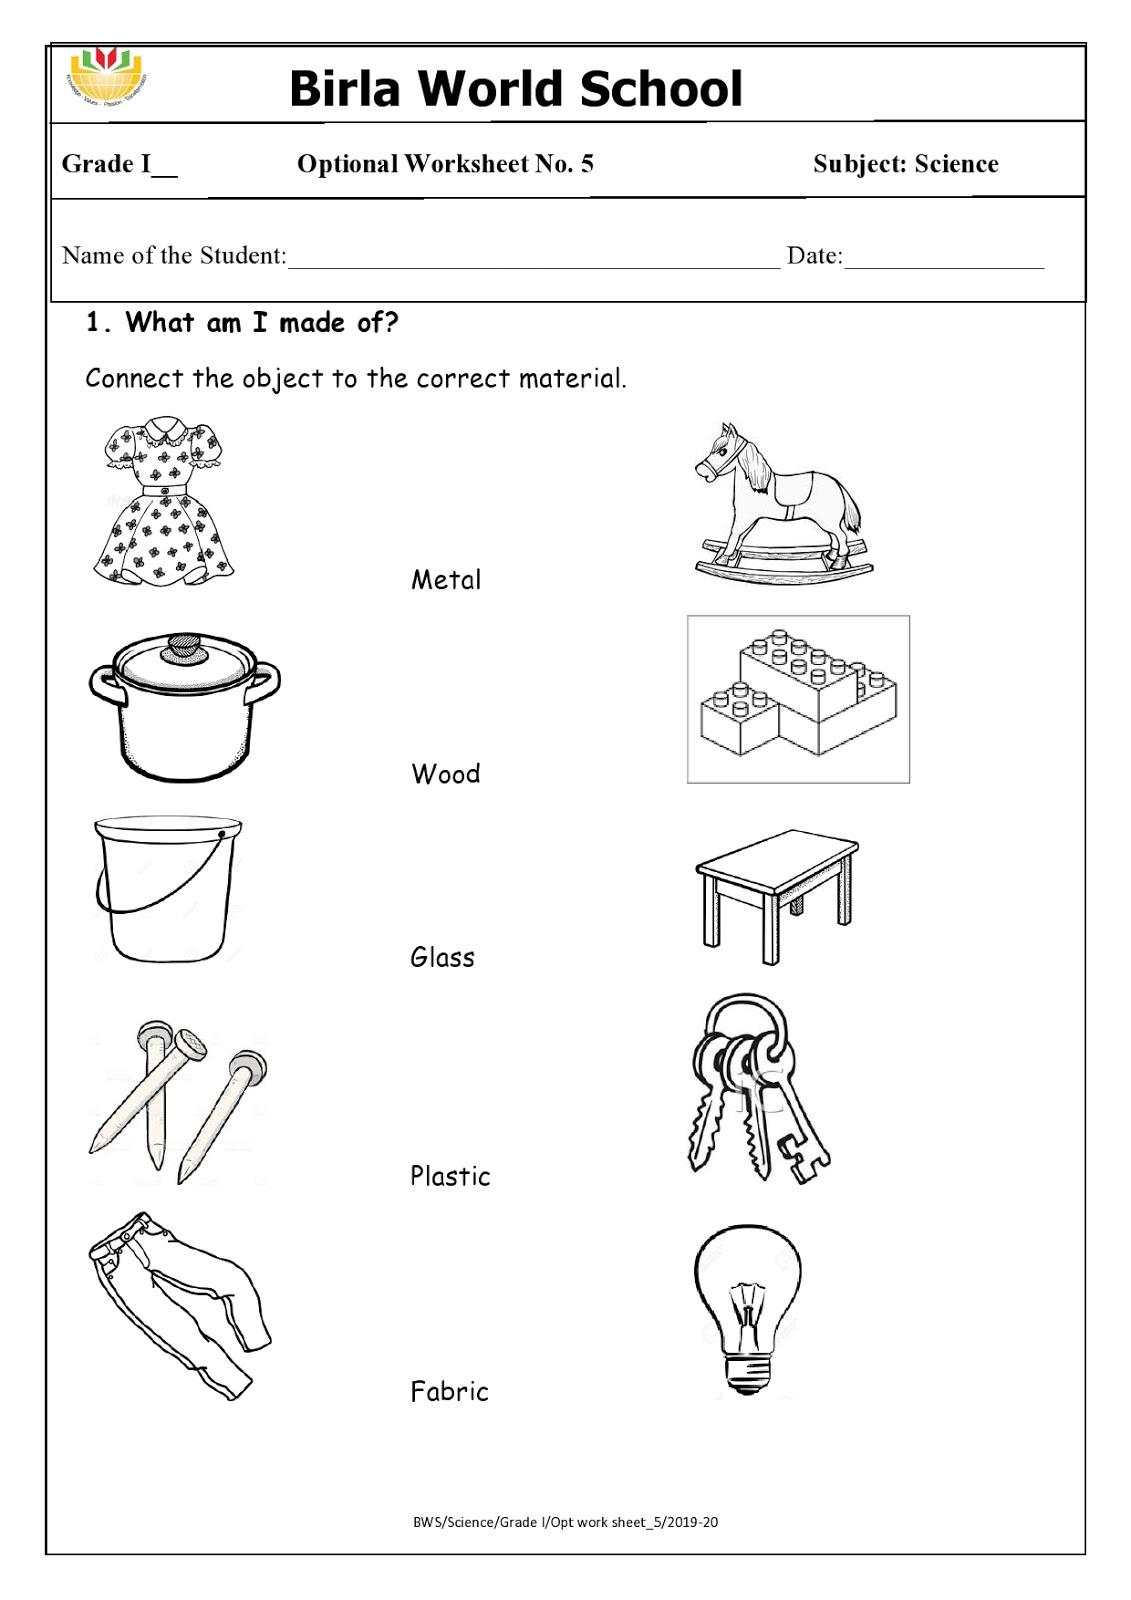 small resolution of WORLD SCHOOL OMAN: Homework for Grade 1 as on 18-02-2020